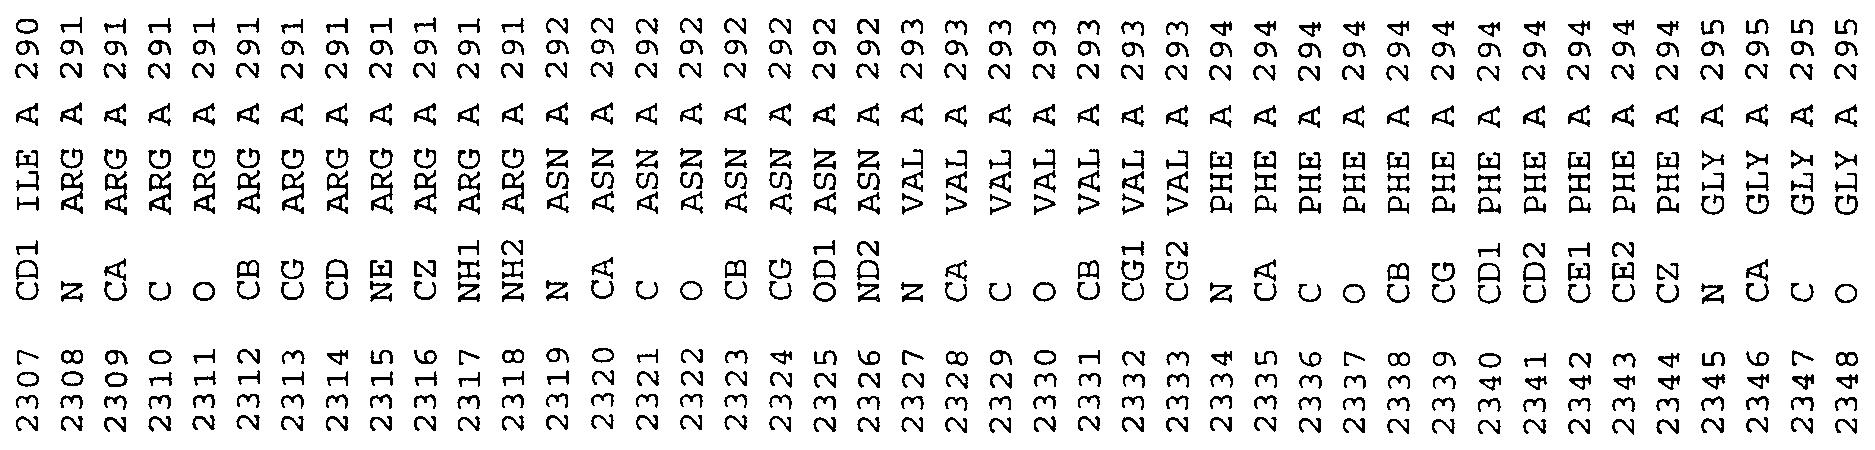 Art 792-0 Cgi #15